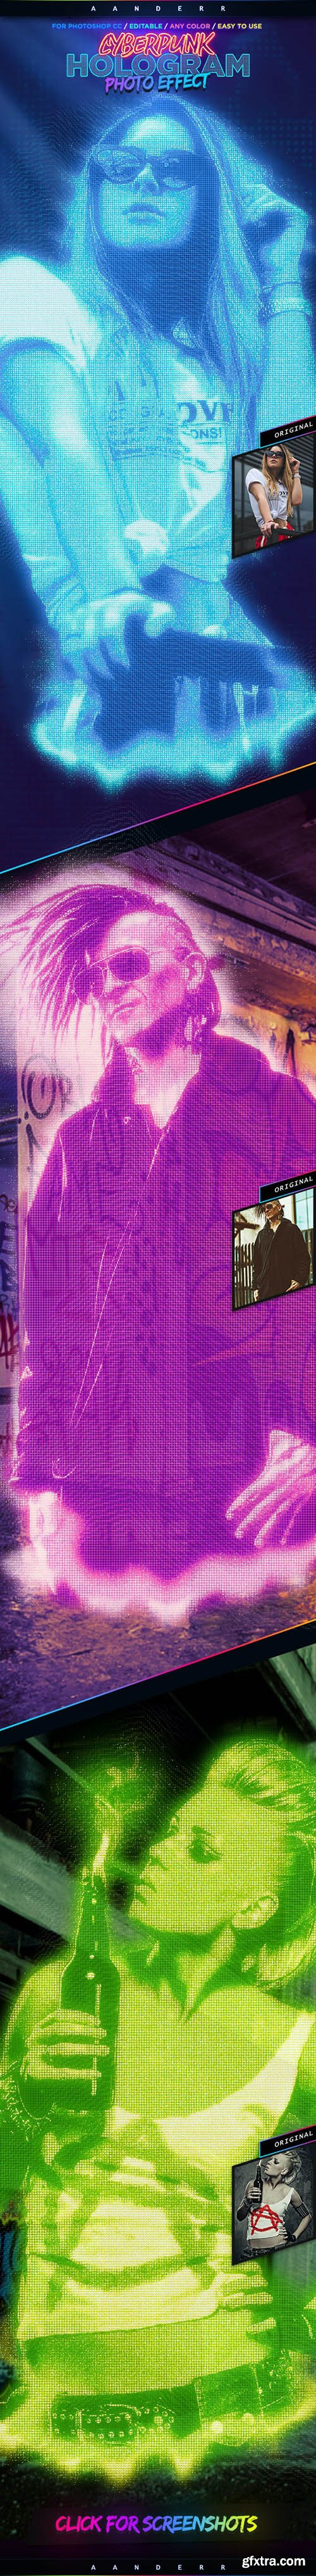 GraphicRiver - Cyberpunk Hologram Photo Effect 28403433